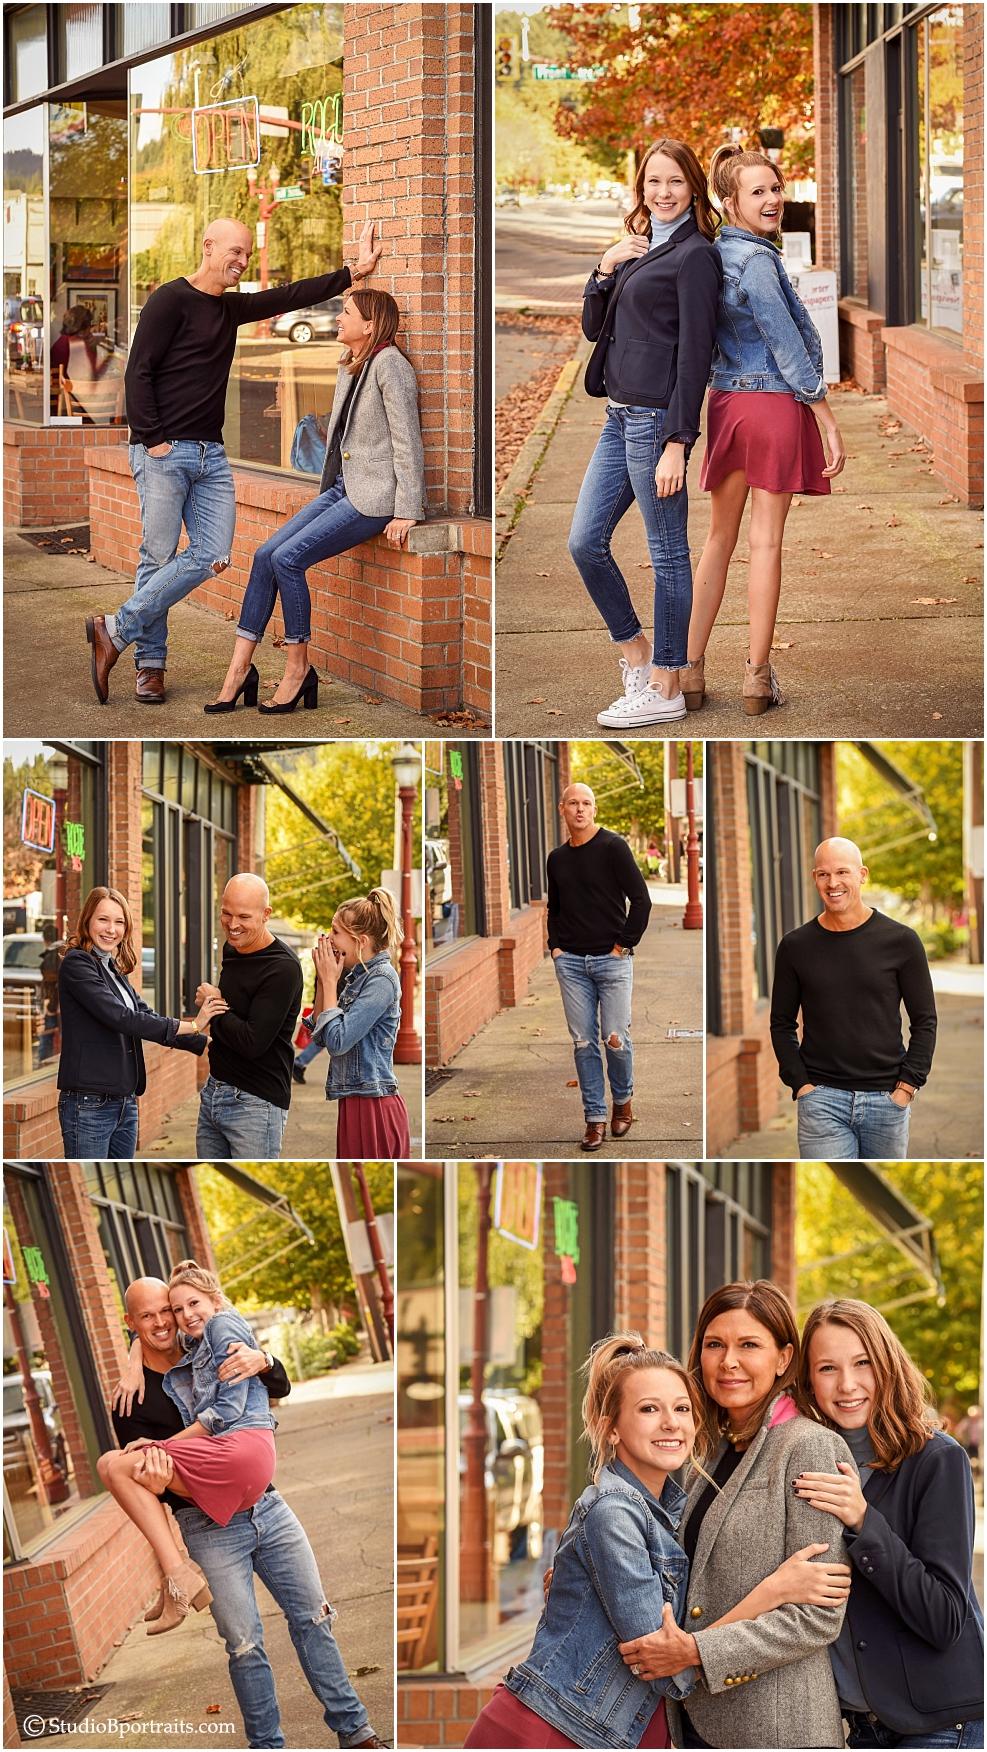 Upscale urban family portraits